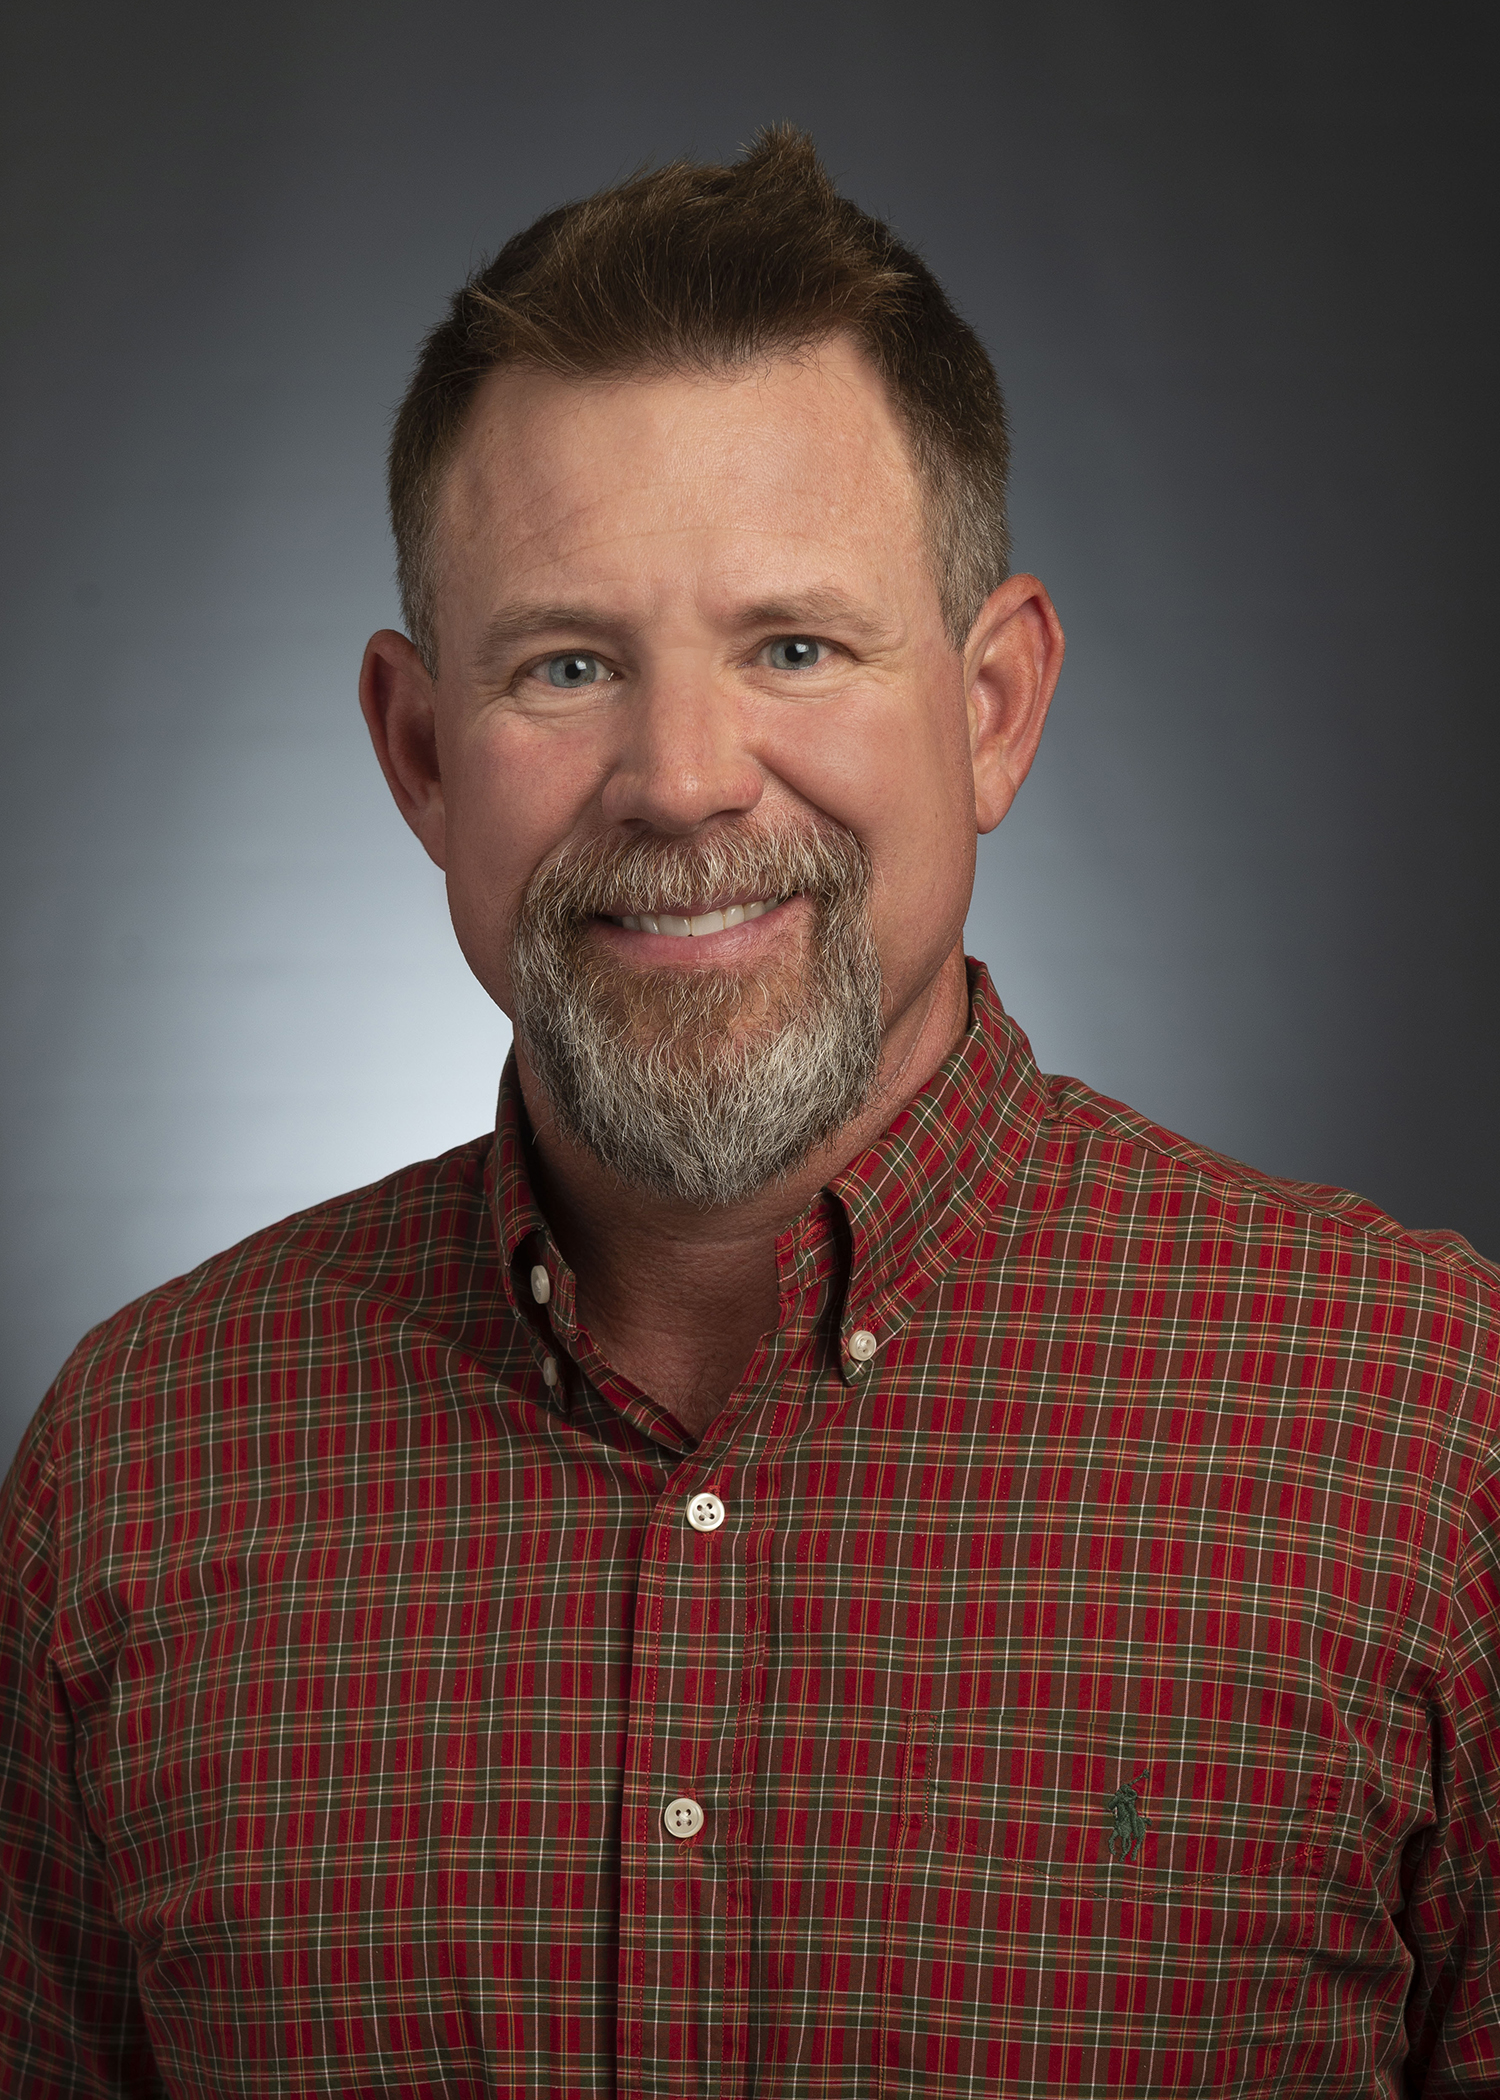 Travis Unruh